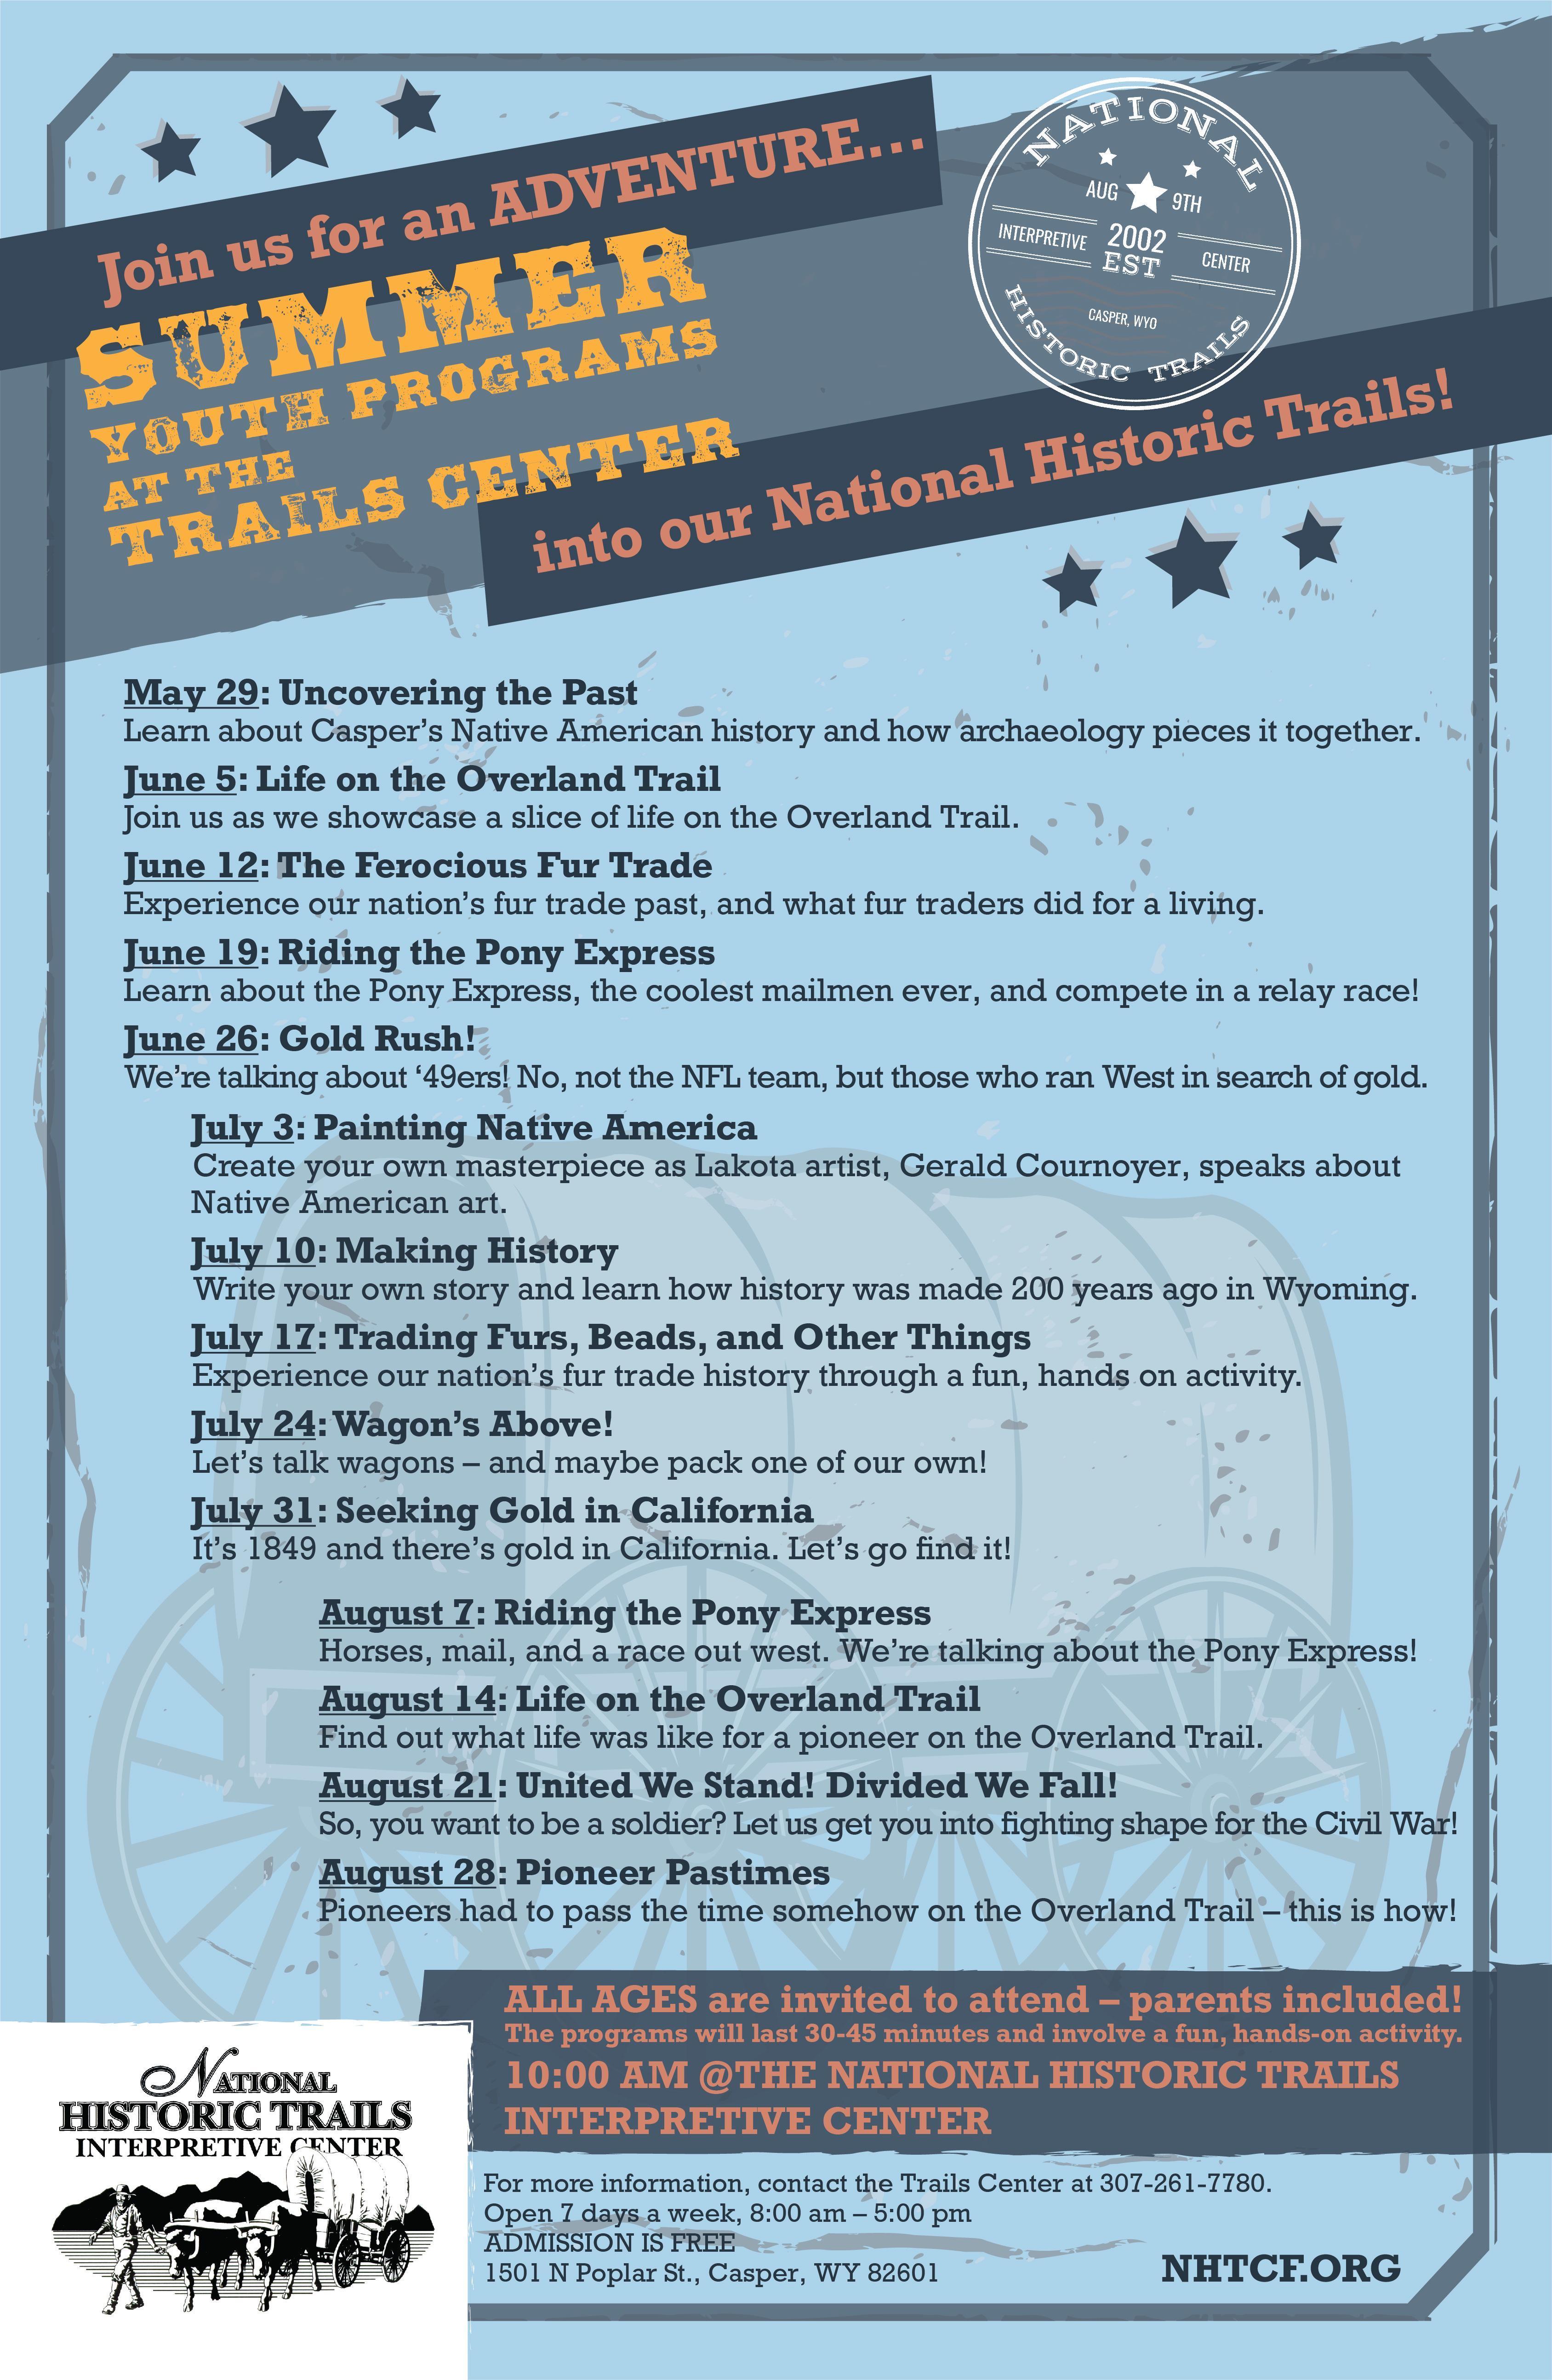 National Historic Trails Interpretive Center Summer Youth Programs